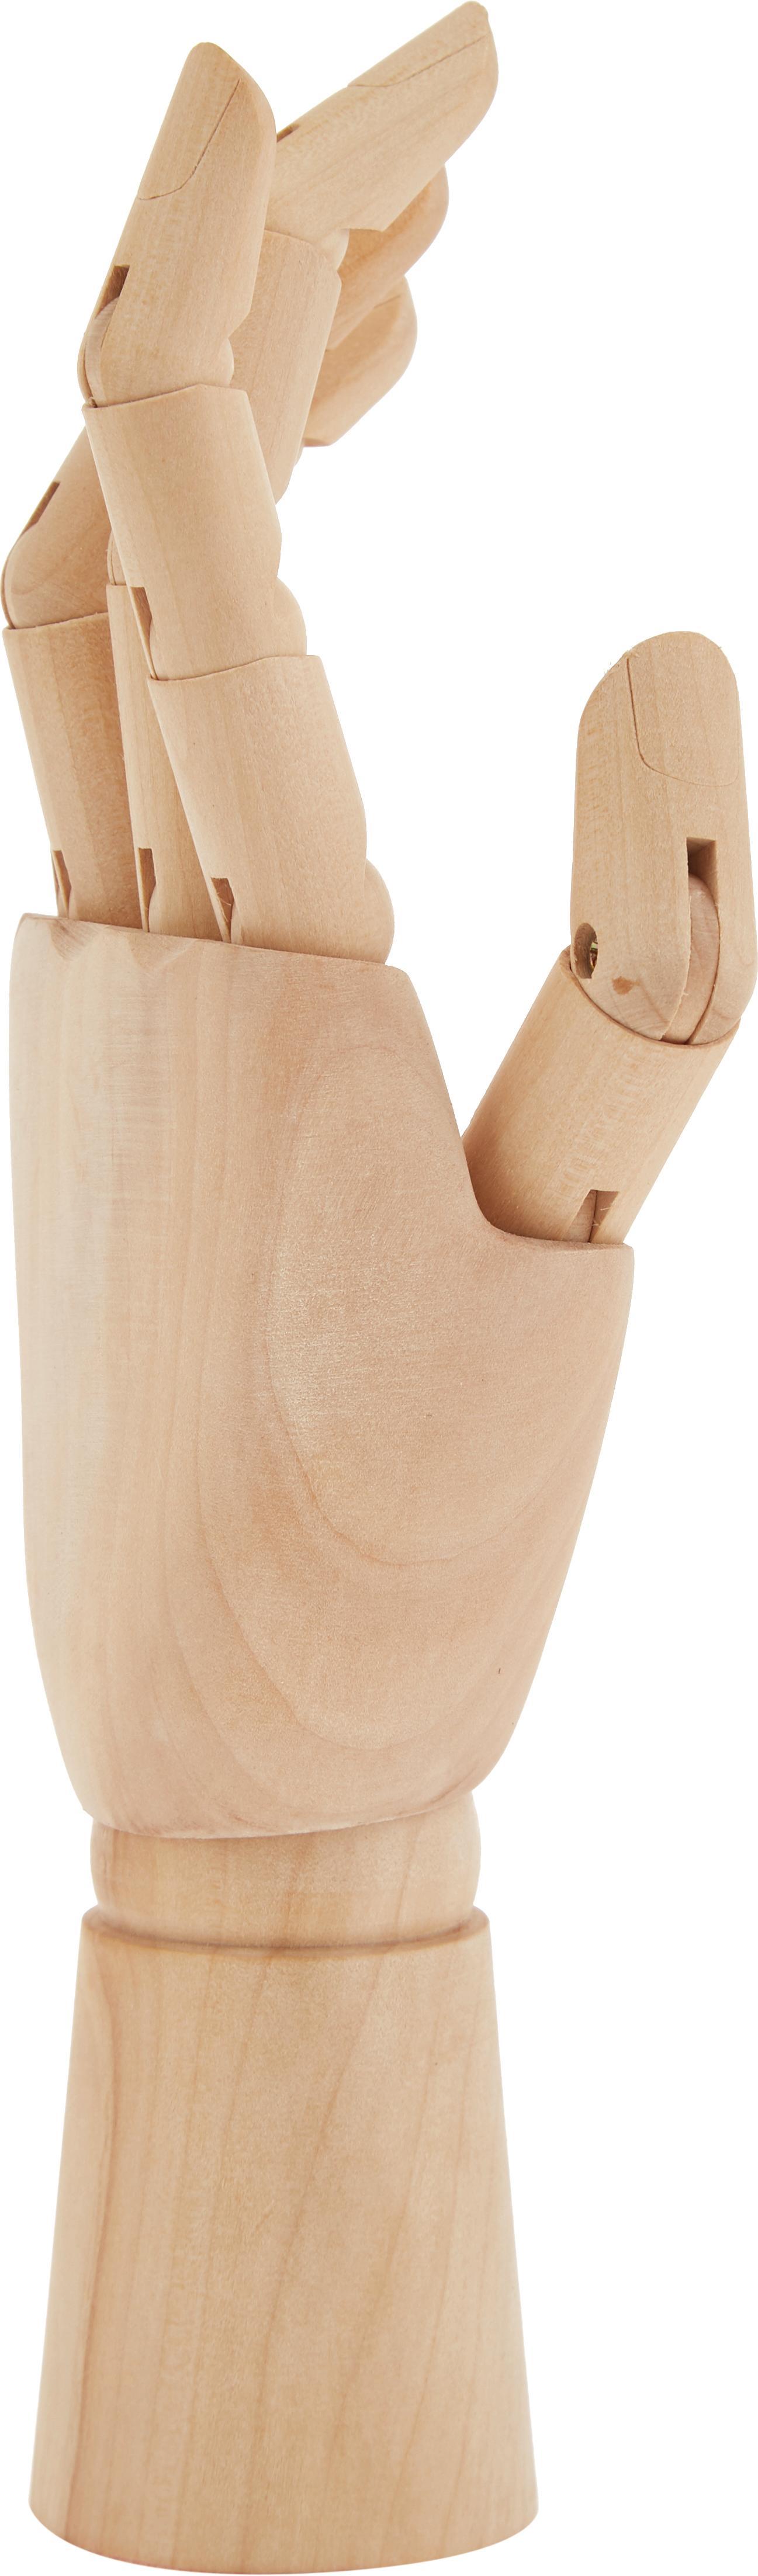 Figura decorativa Hand, Madera, Bayo, An 7 x Al 25 cm